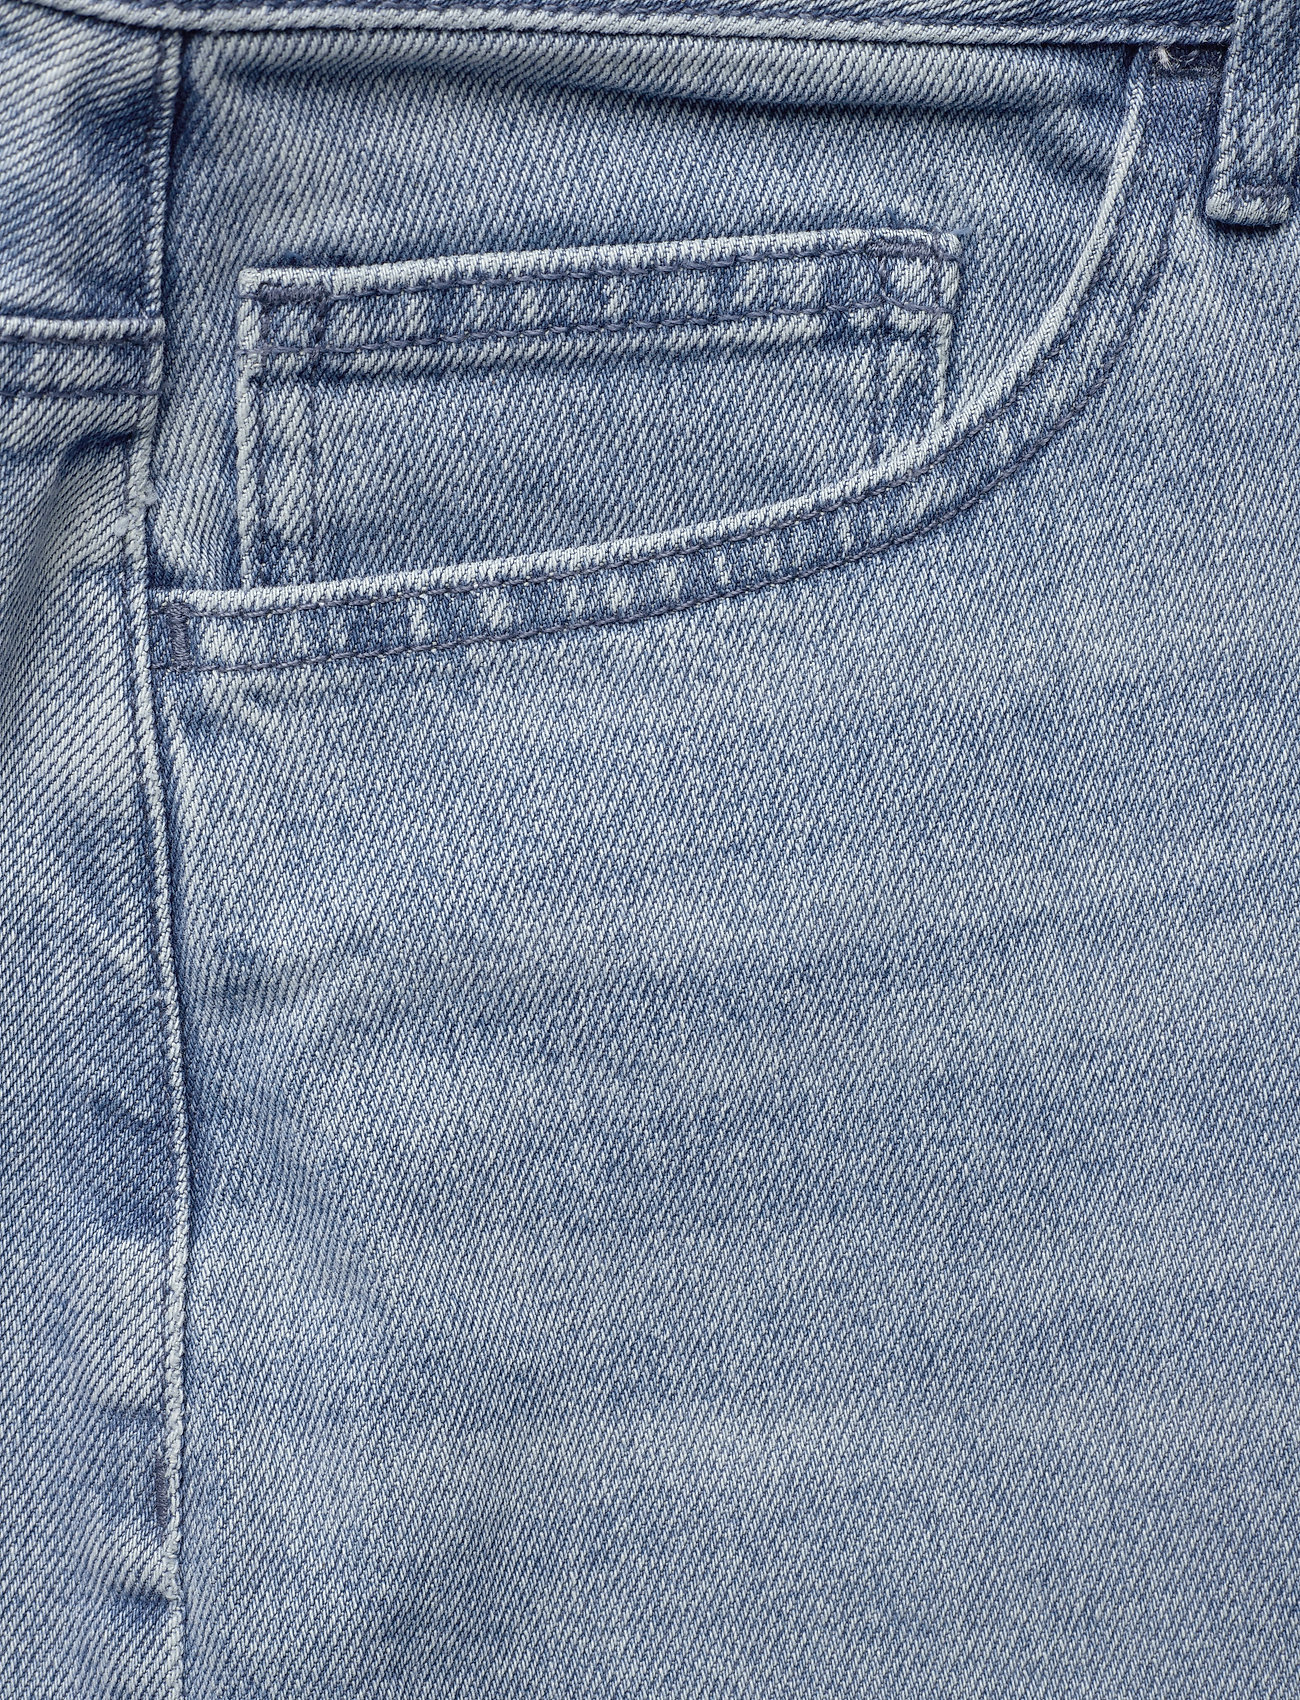 Boss J90 Elgin - Kjolar Bright Blue